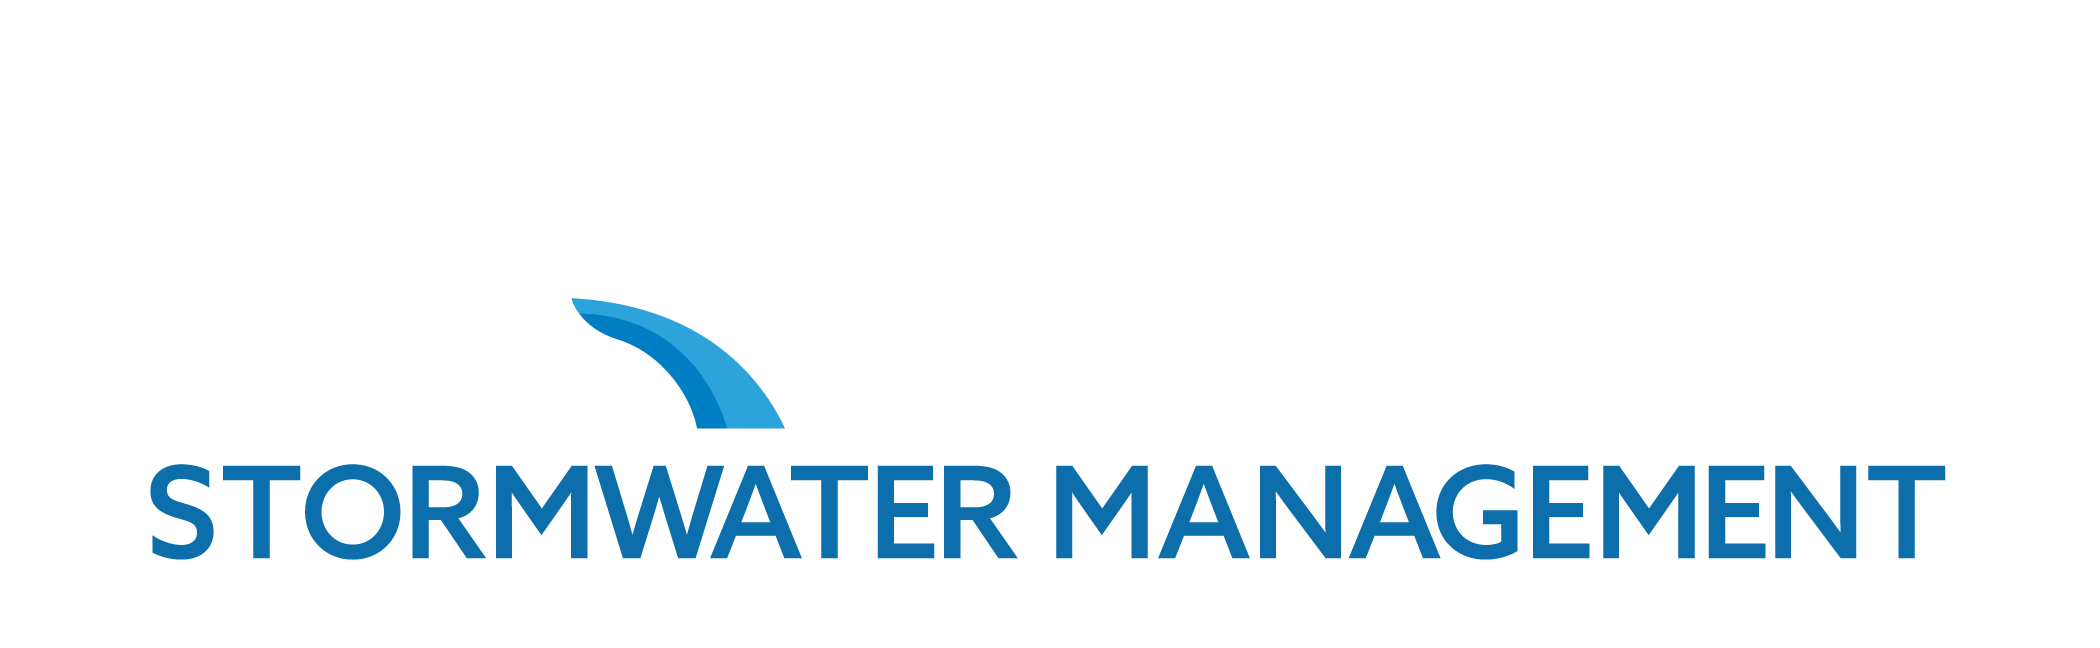 AQUALIS brand logo white